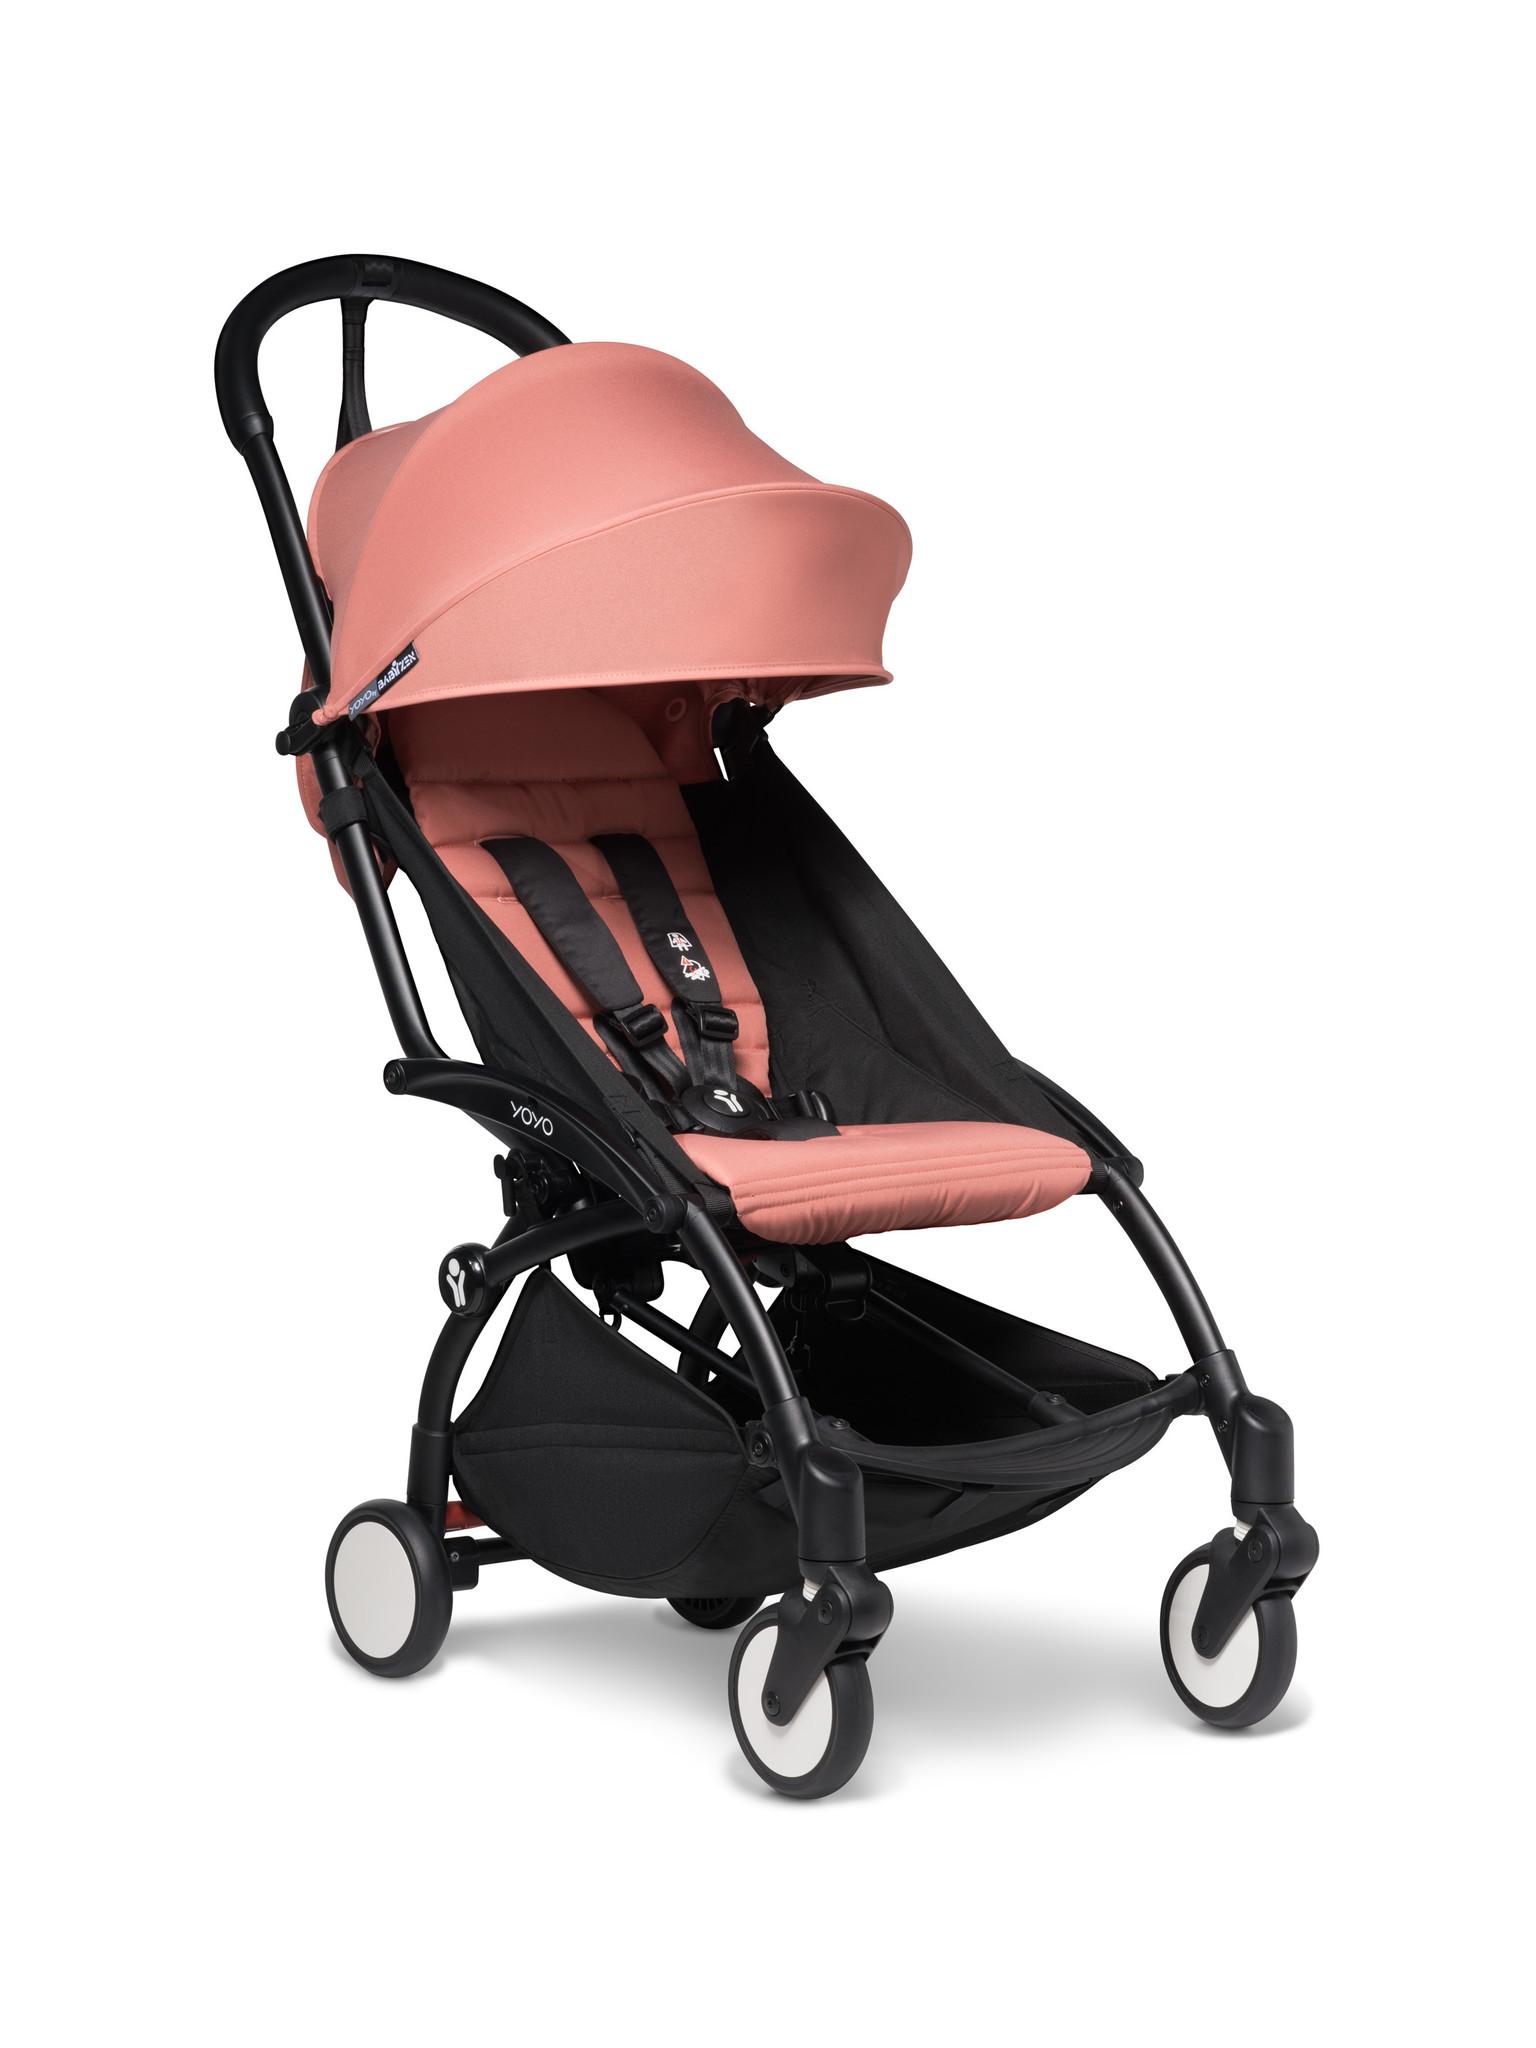 Babyzen Babyzen YOYO² buggy COMPLEET / FULL SET 0+ and 6+ ginger frame zwart incl. YOYO² BeSafe autostoel zwart